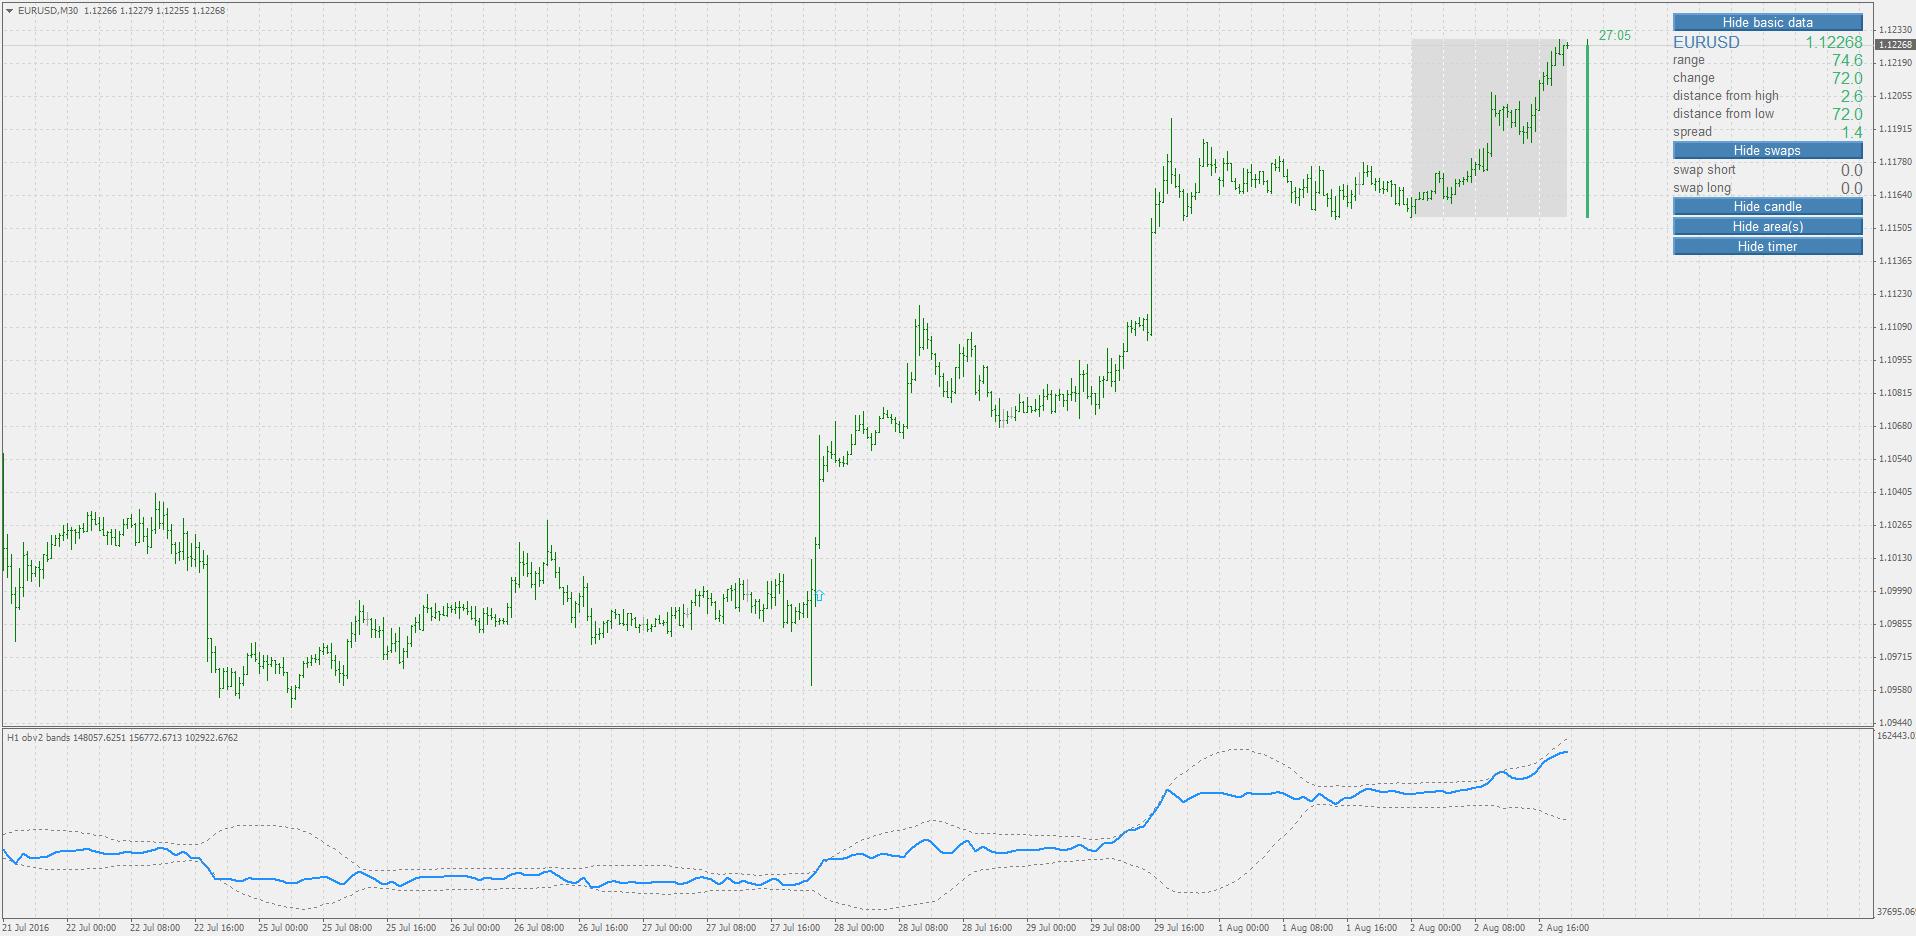 Obv trading strategies